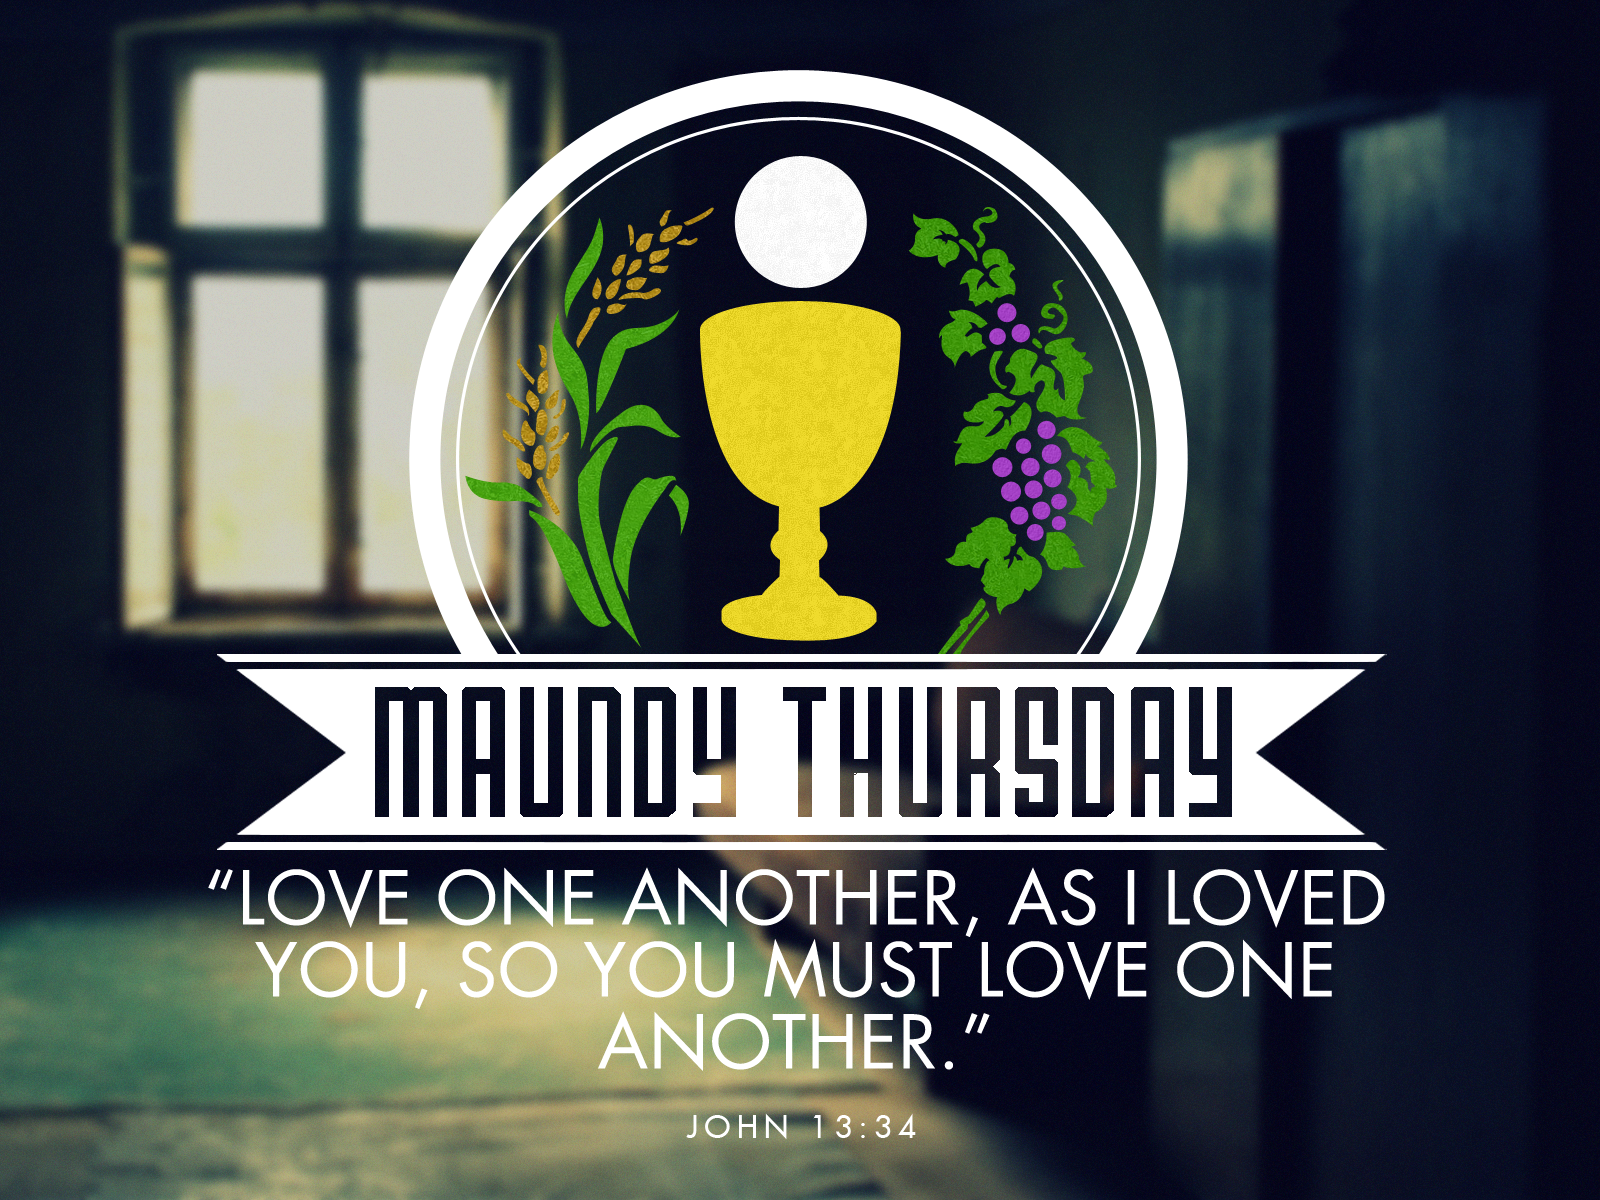 Maunday Thursday bible verses Maundy Thursday